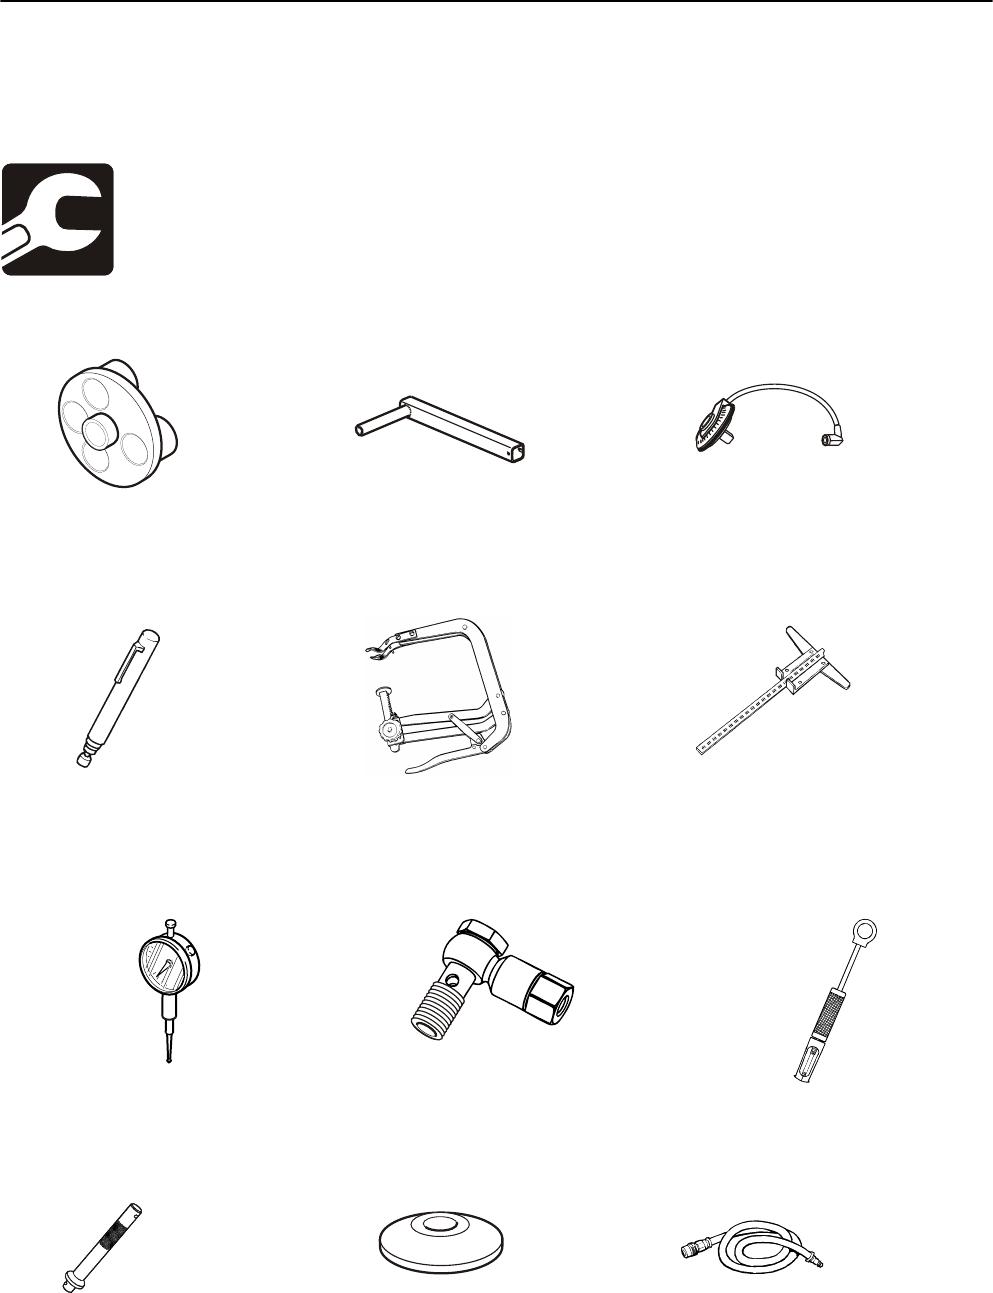 08 2 special service tools